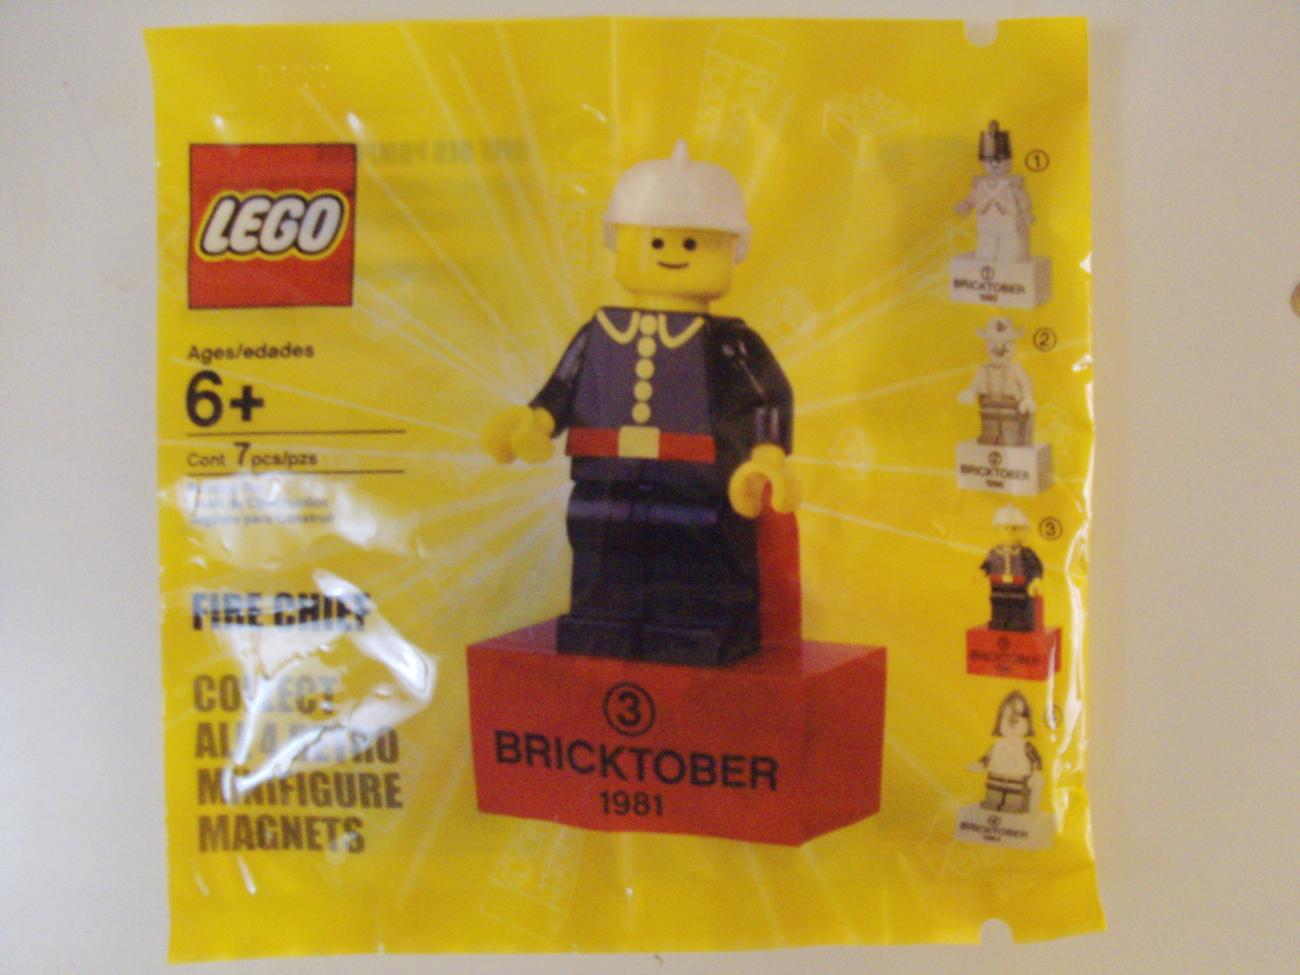 Lego Bricktober Fire Chief #3 of 4 Retro Minifigure Toys R Us Exclusive - New